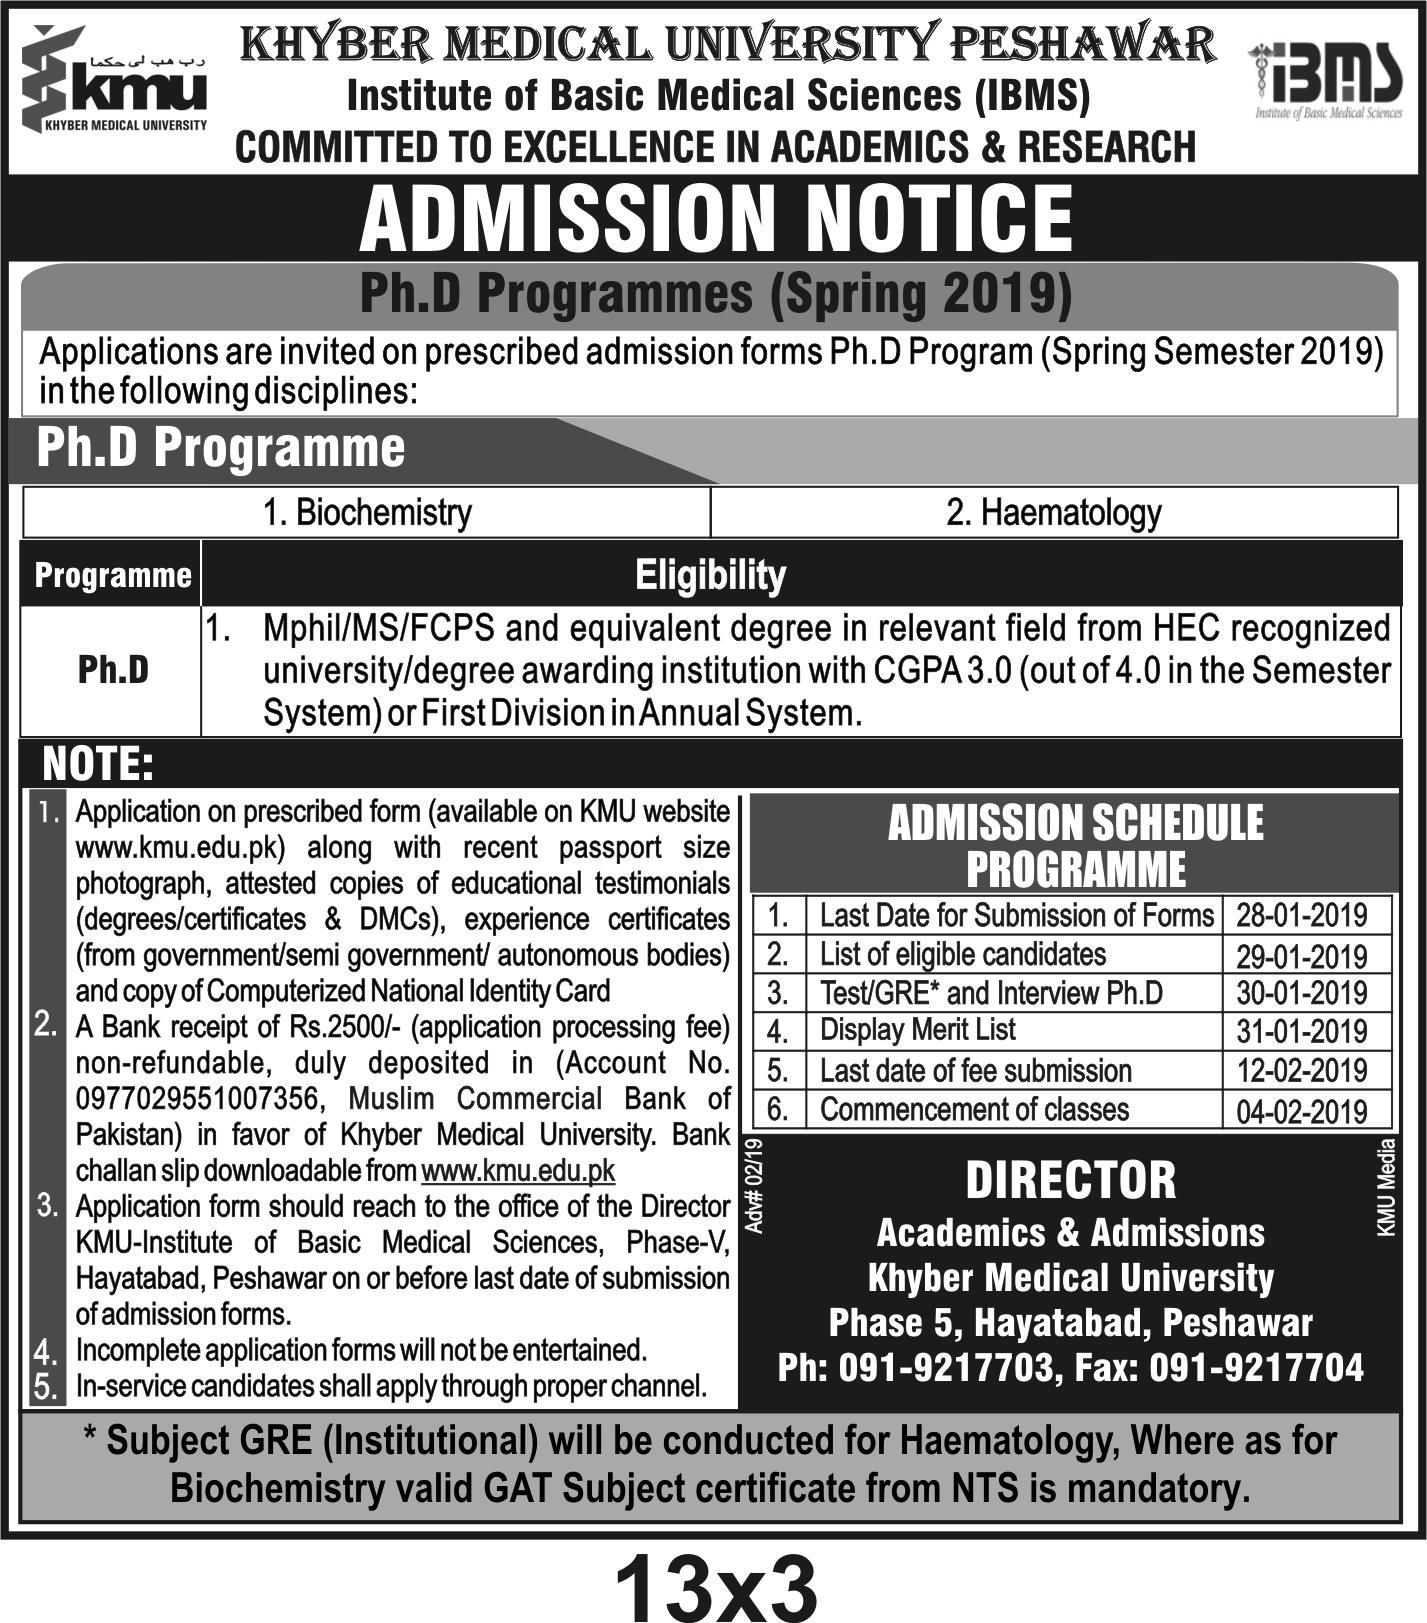 KMU Peshawar Admissions Spring 2019 Graduate, Postgraduate Form Date